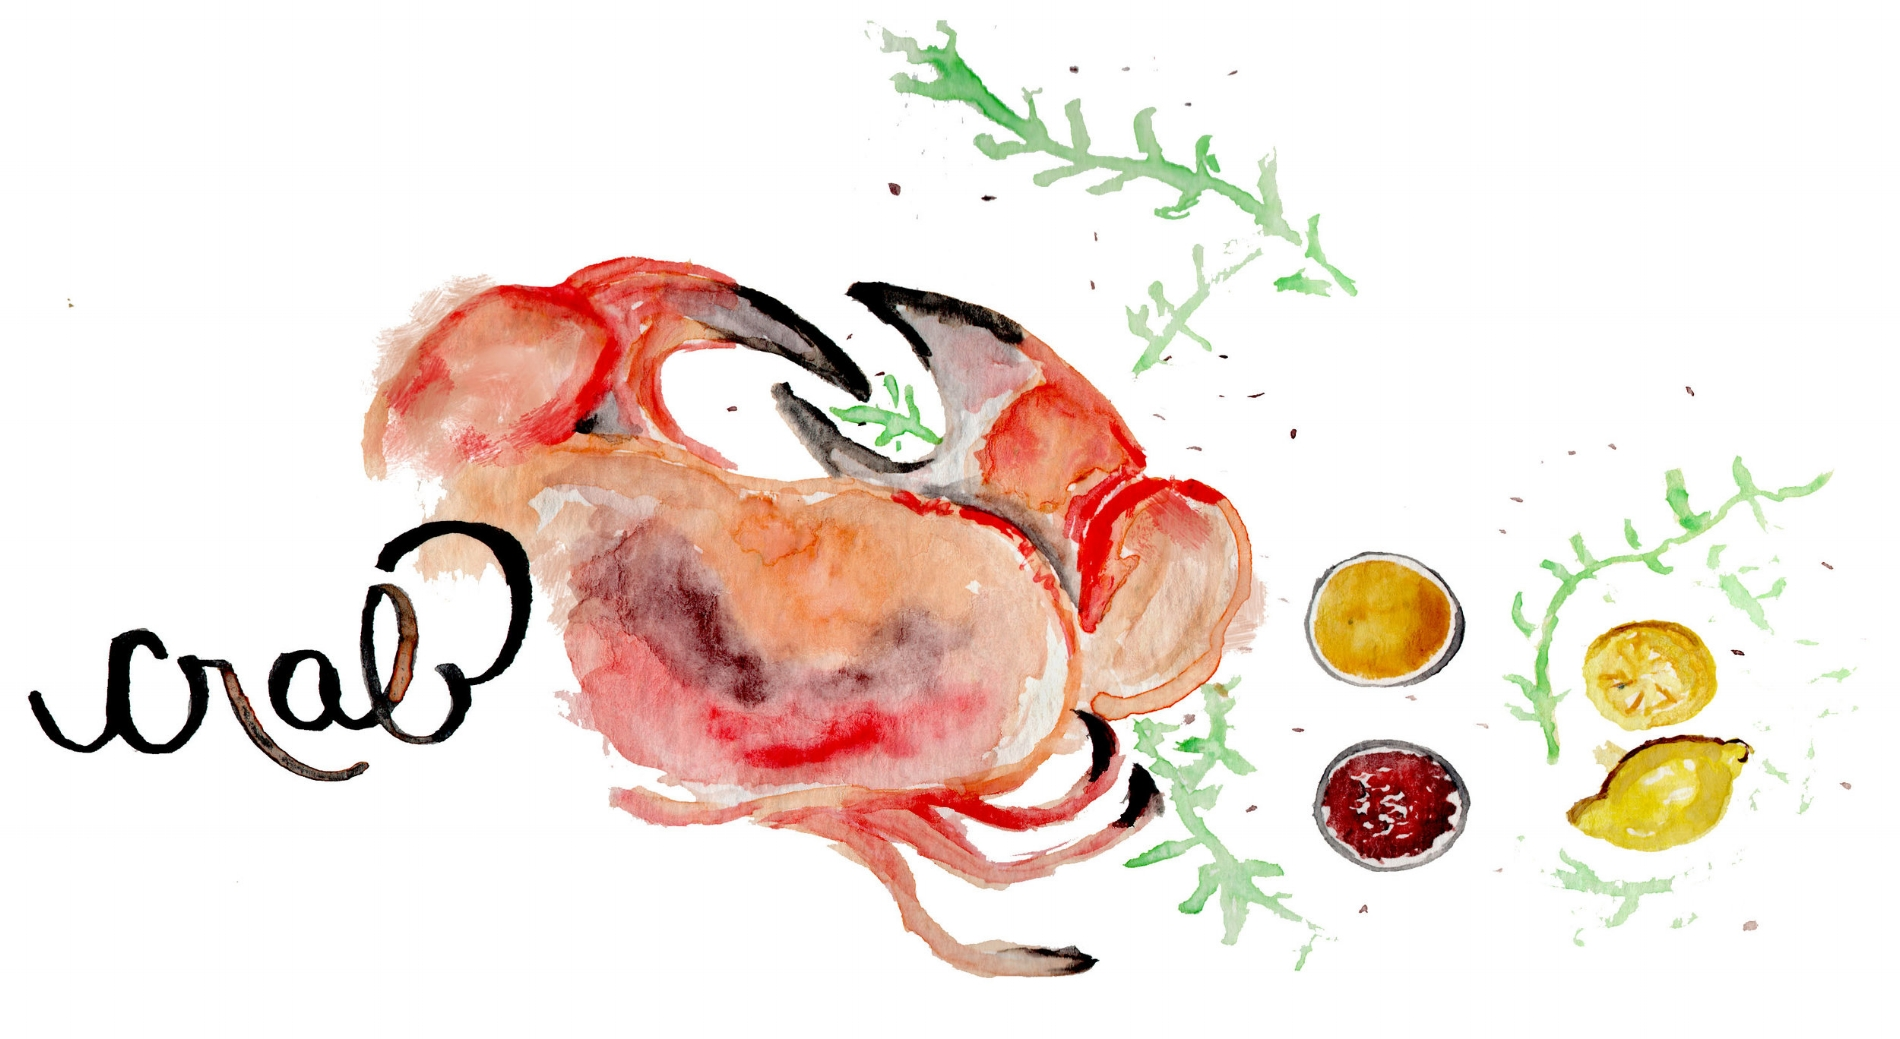 crabdrawing.jpg